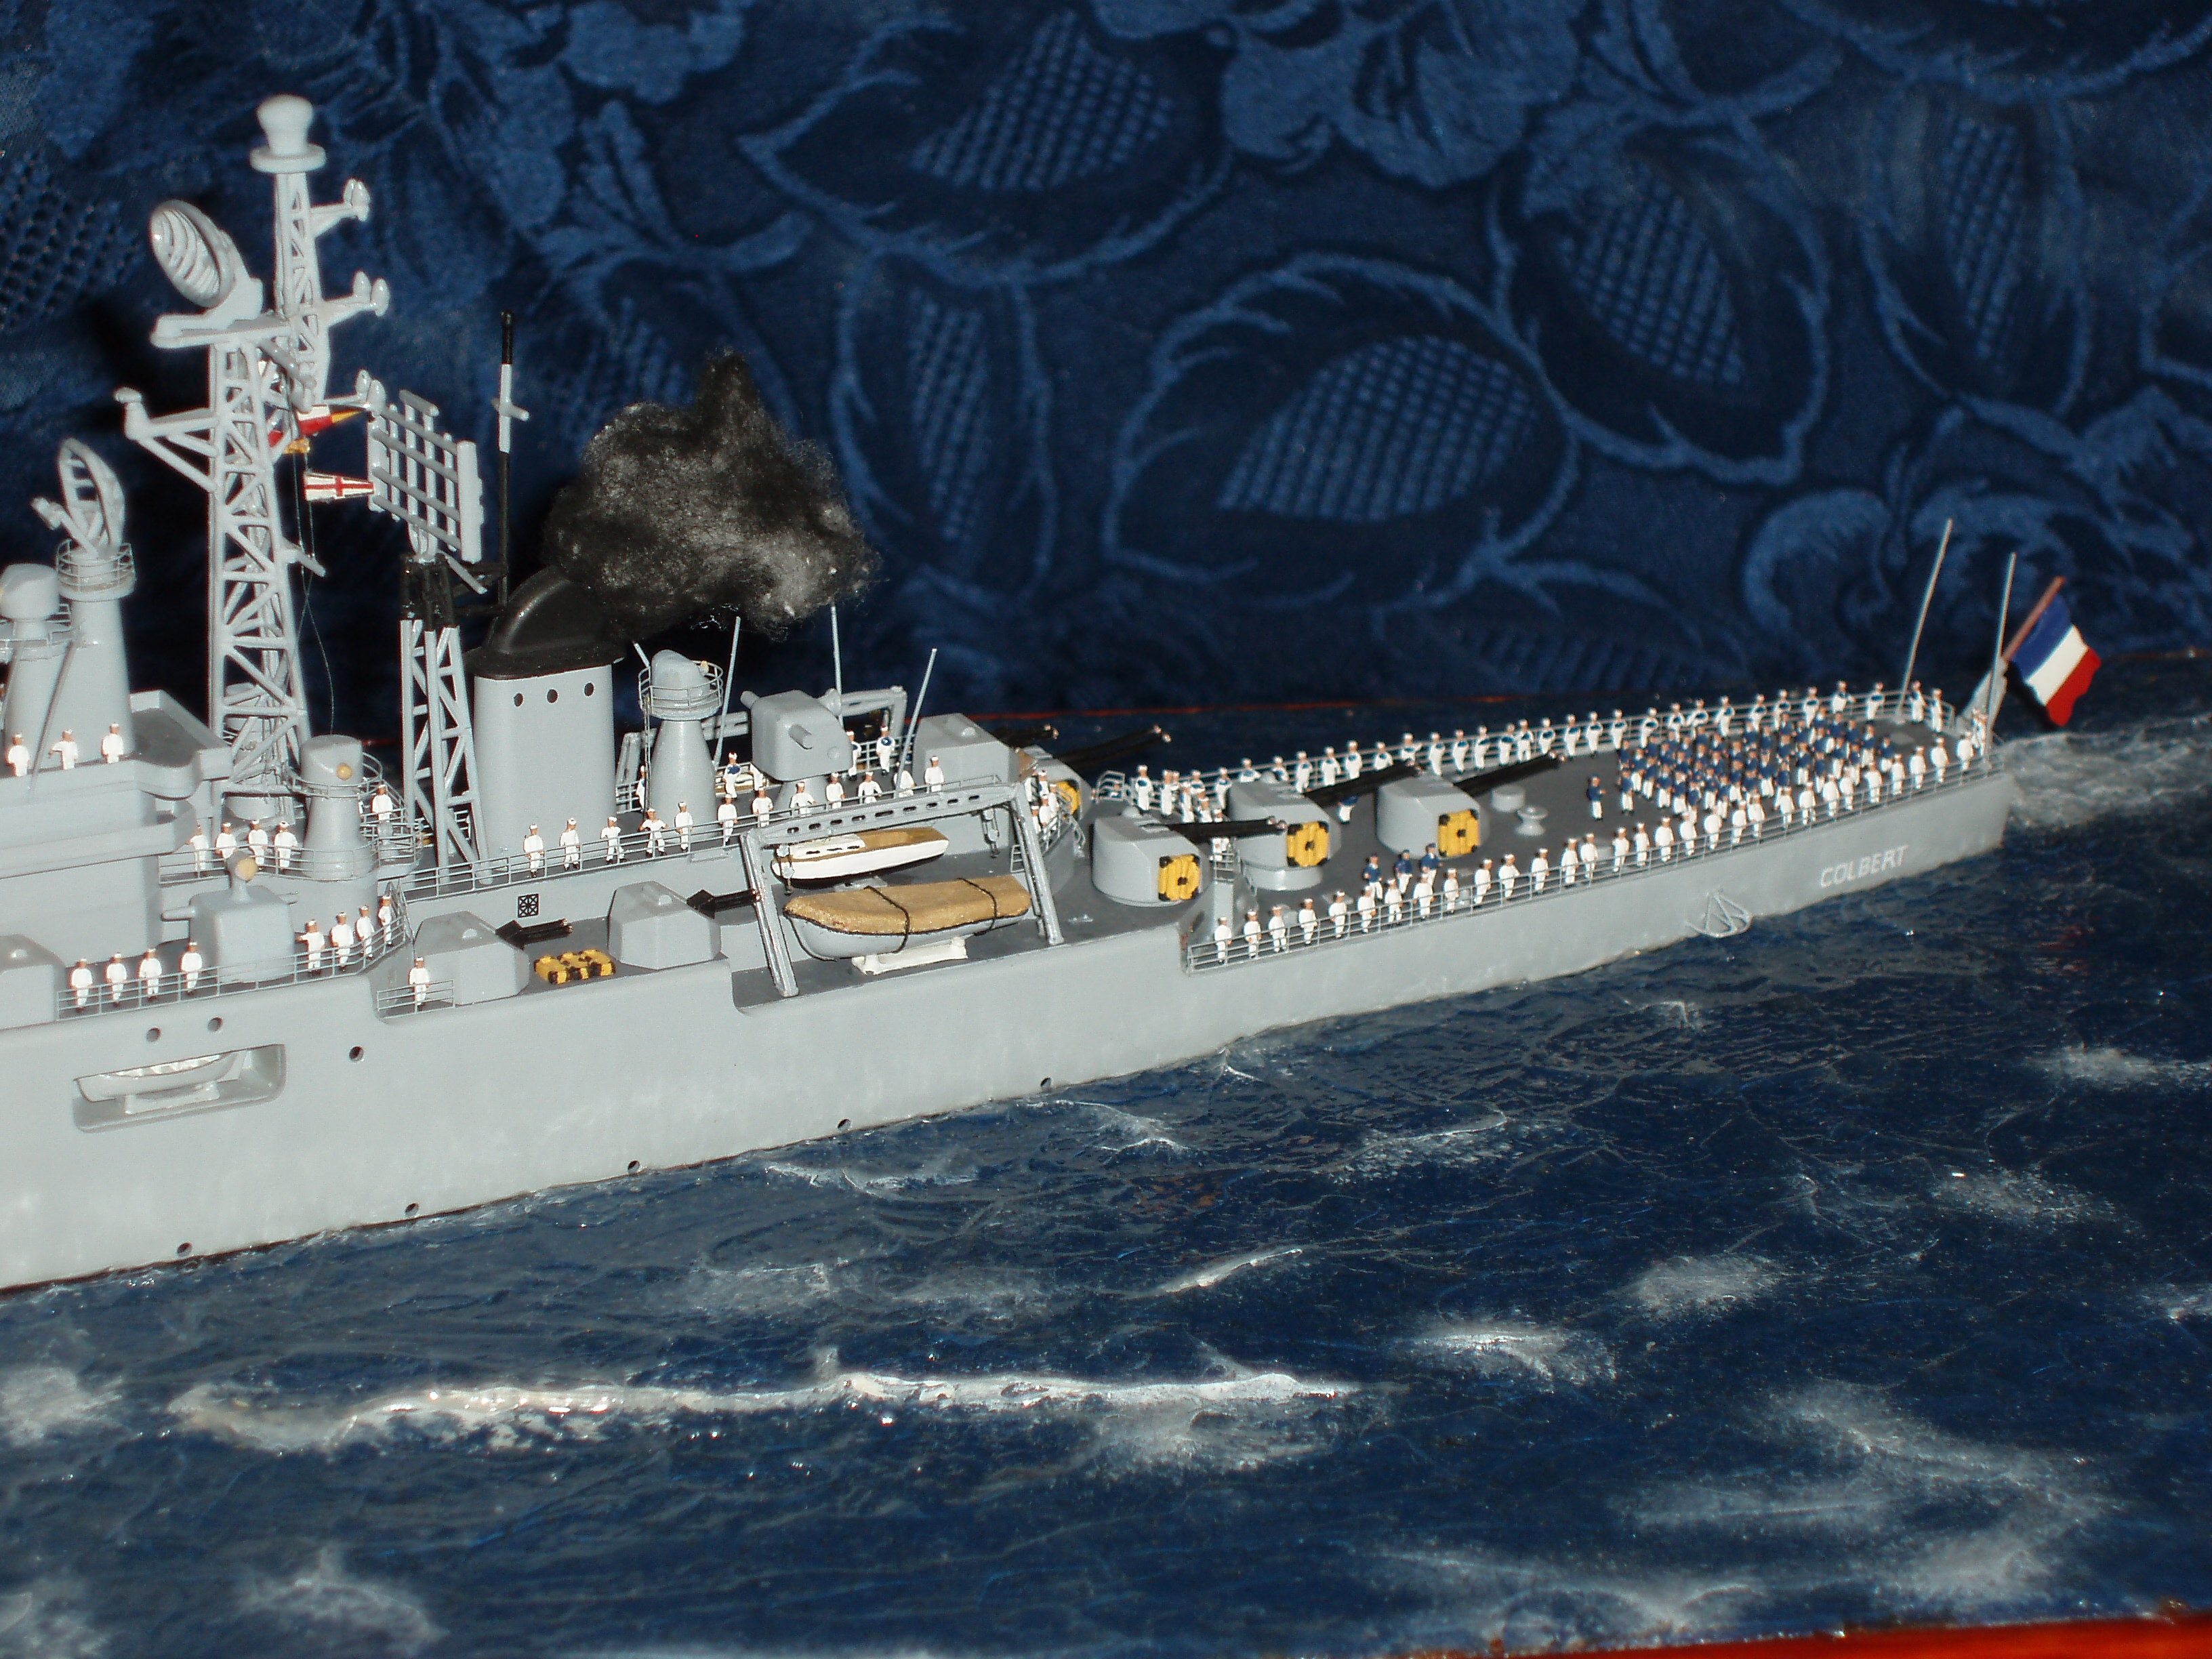 Le Croiseur COLBERT, Heller 1/400 +photodecoupe + resine 94900027s6